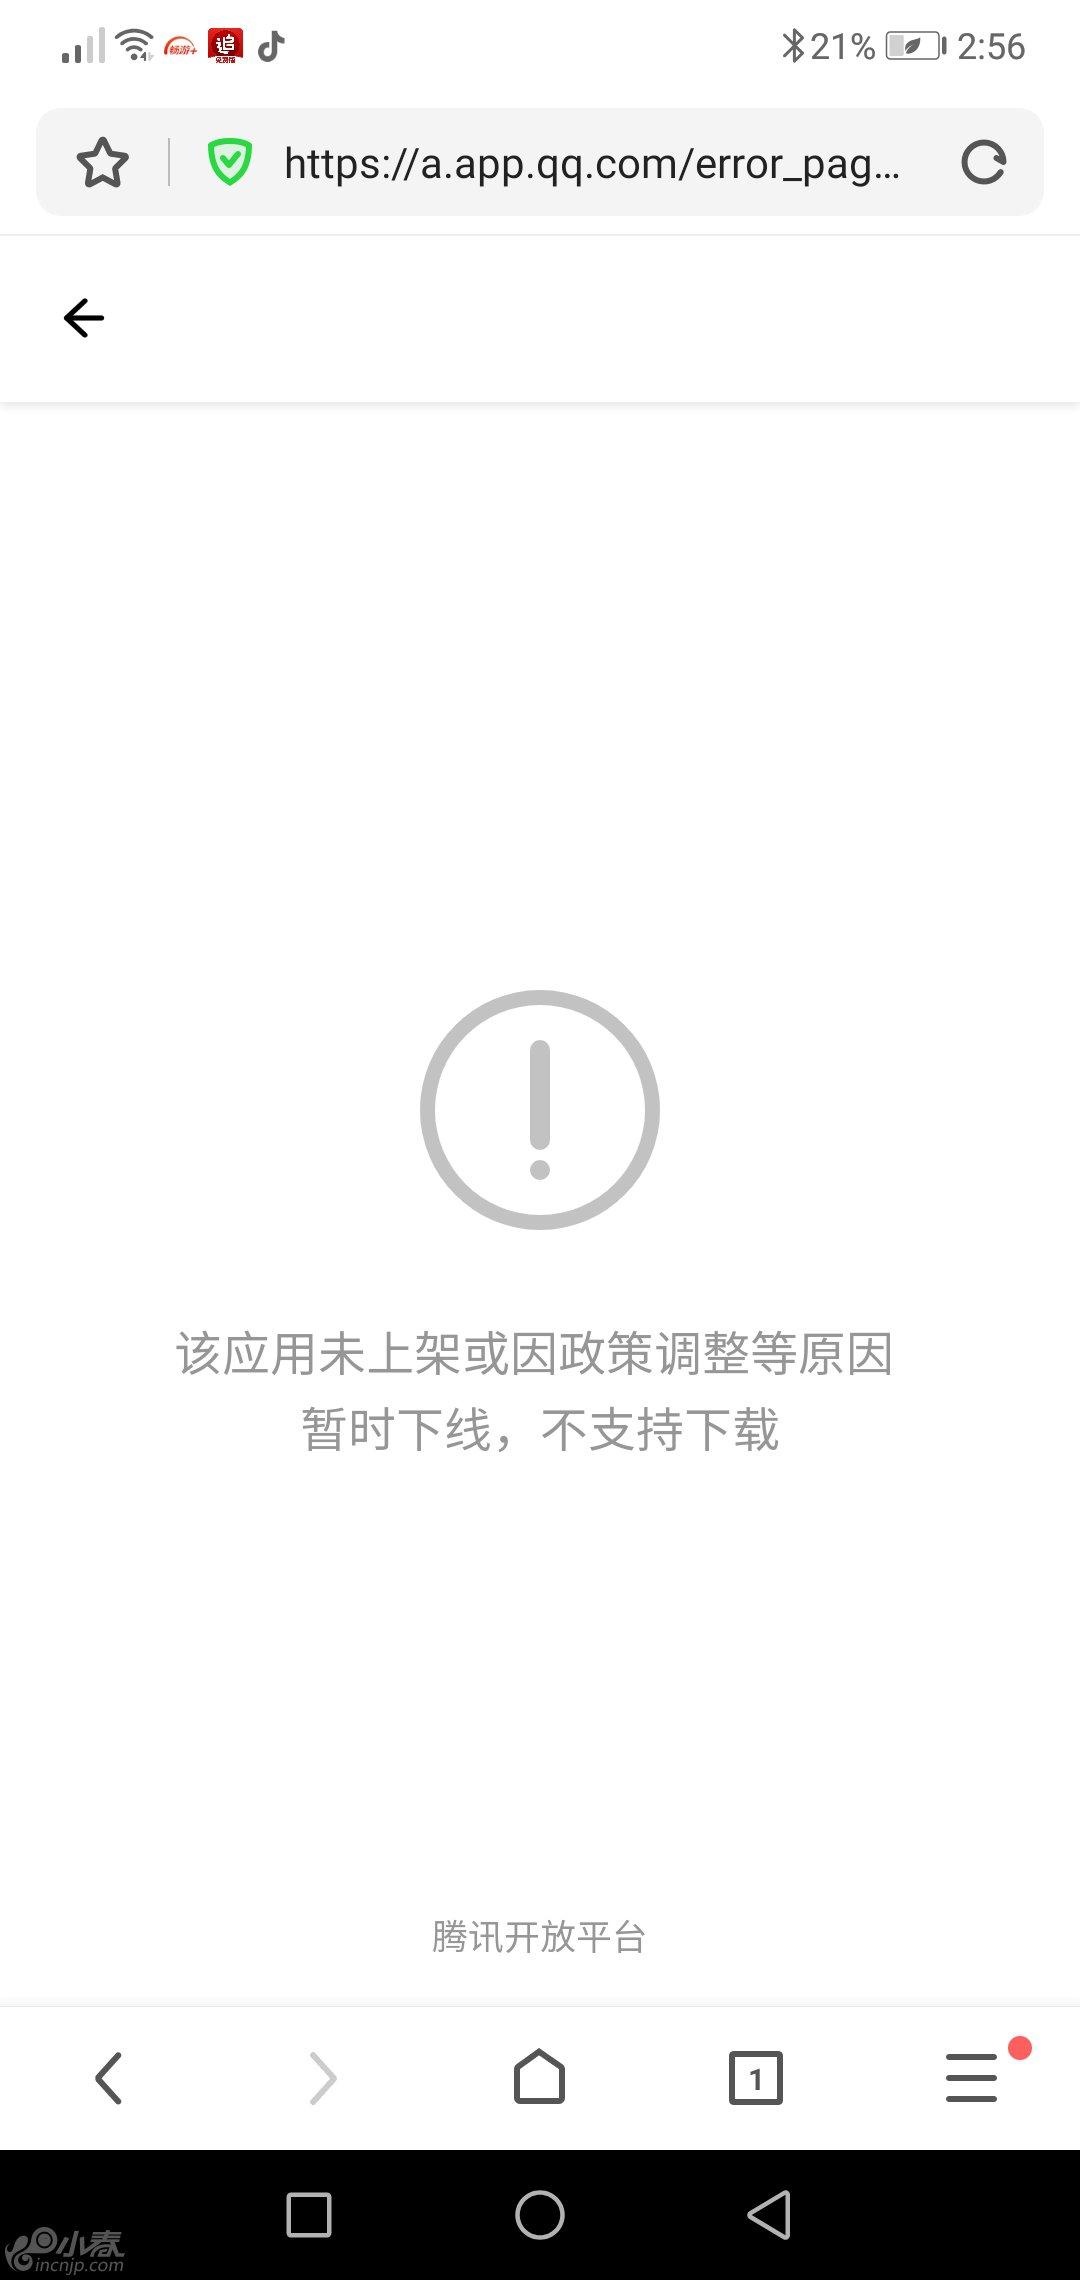 Screenshot_20200704_025605_com.qihoo.contents.jpg